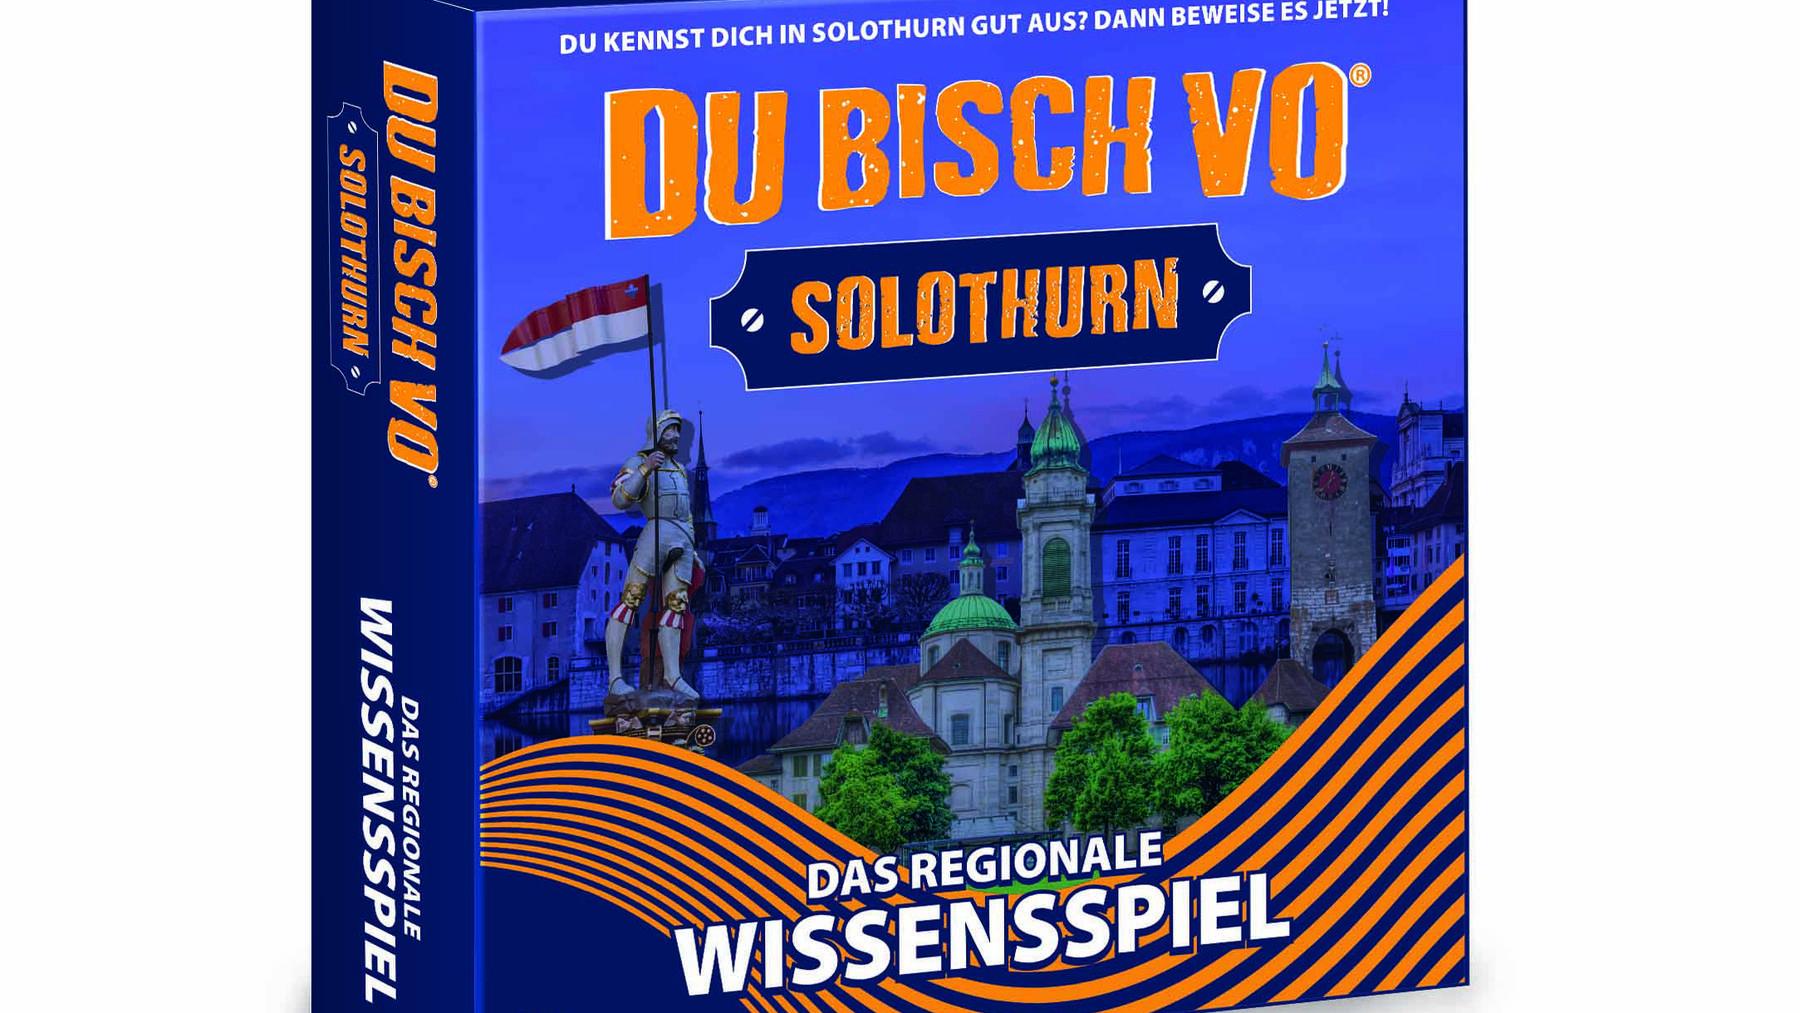 Mockup - DuB isch Vo Solothurn 2021